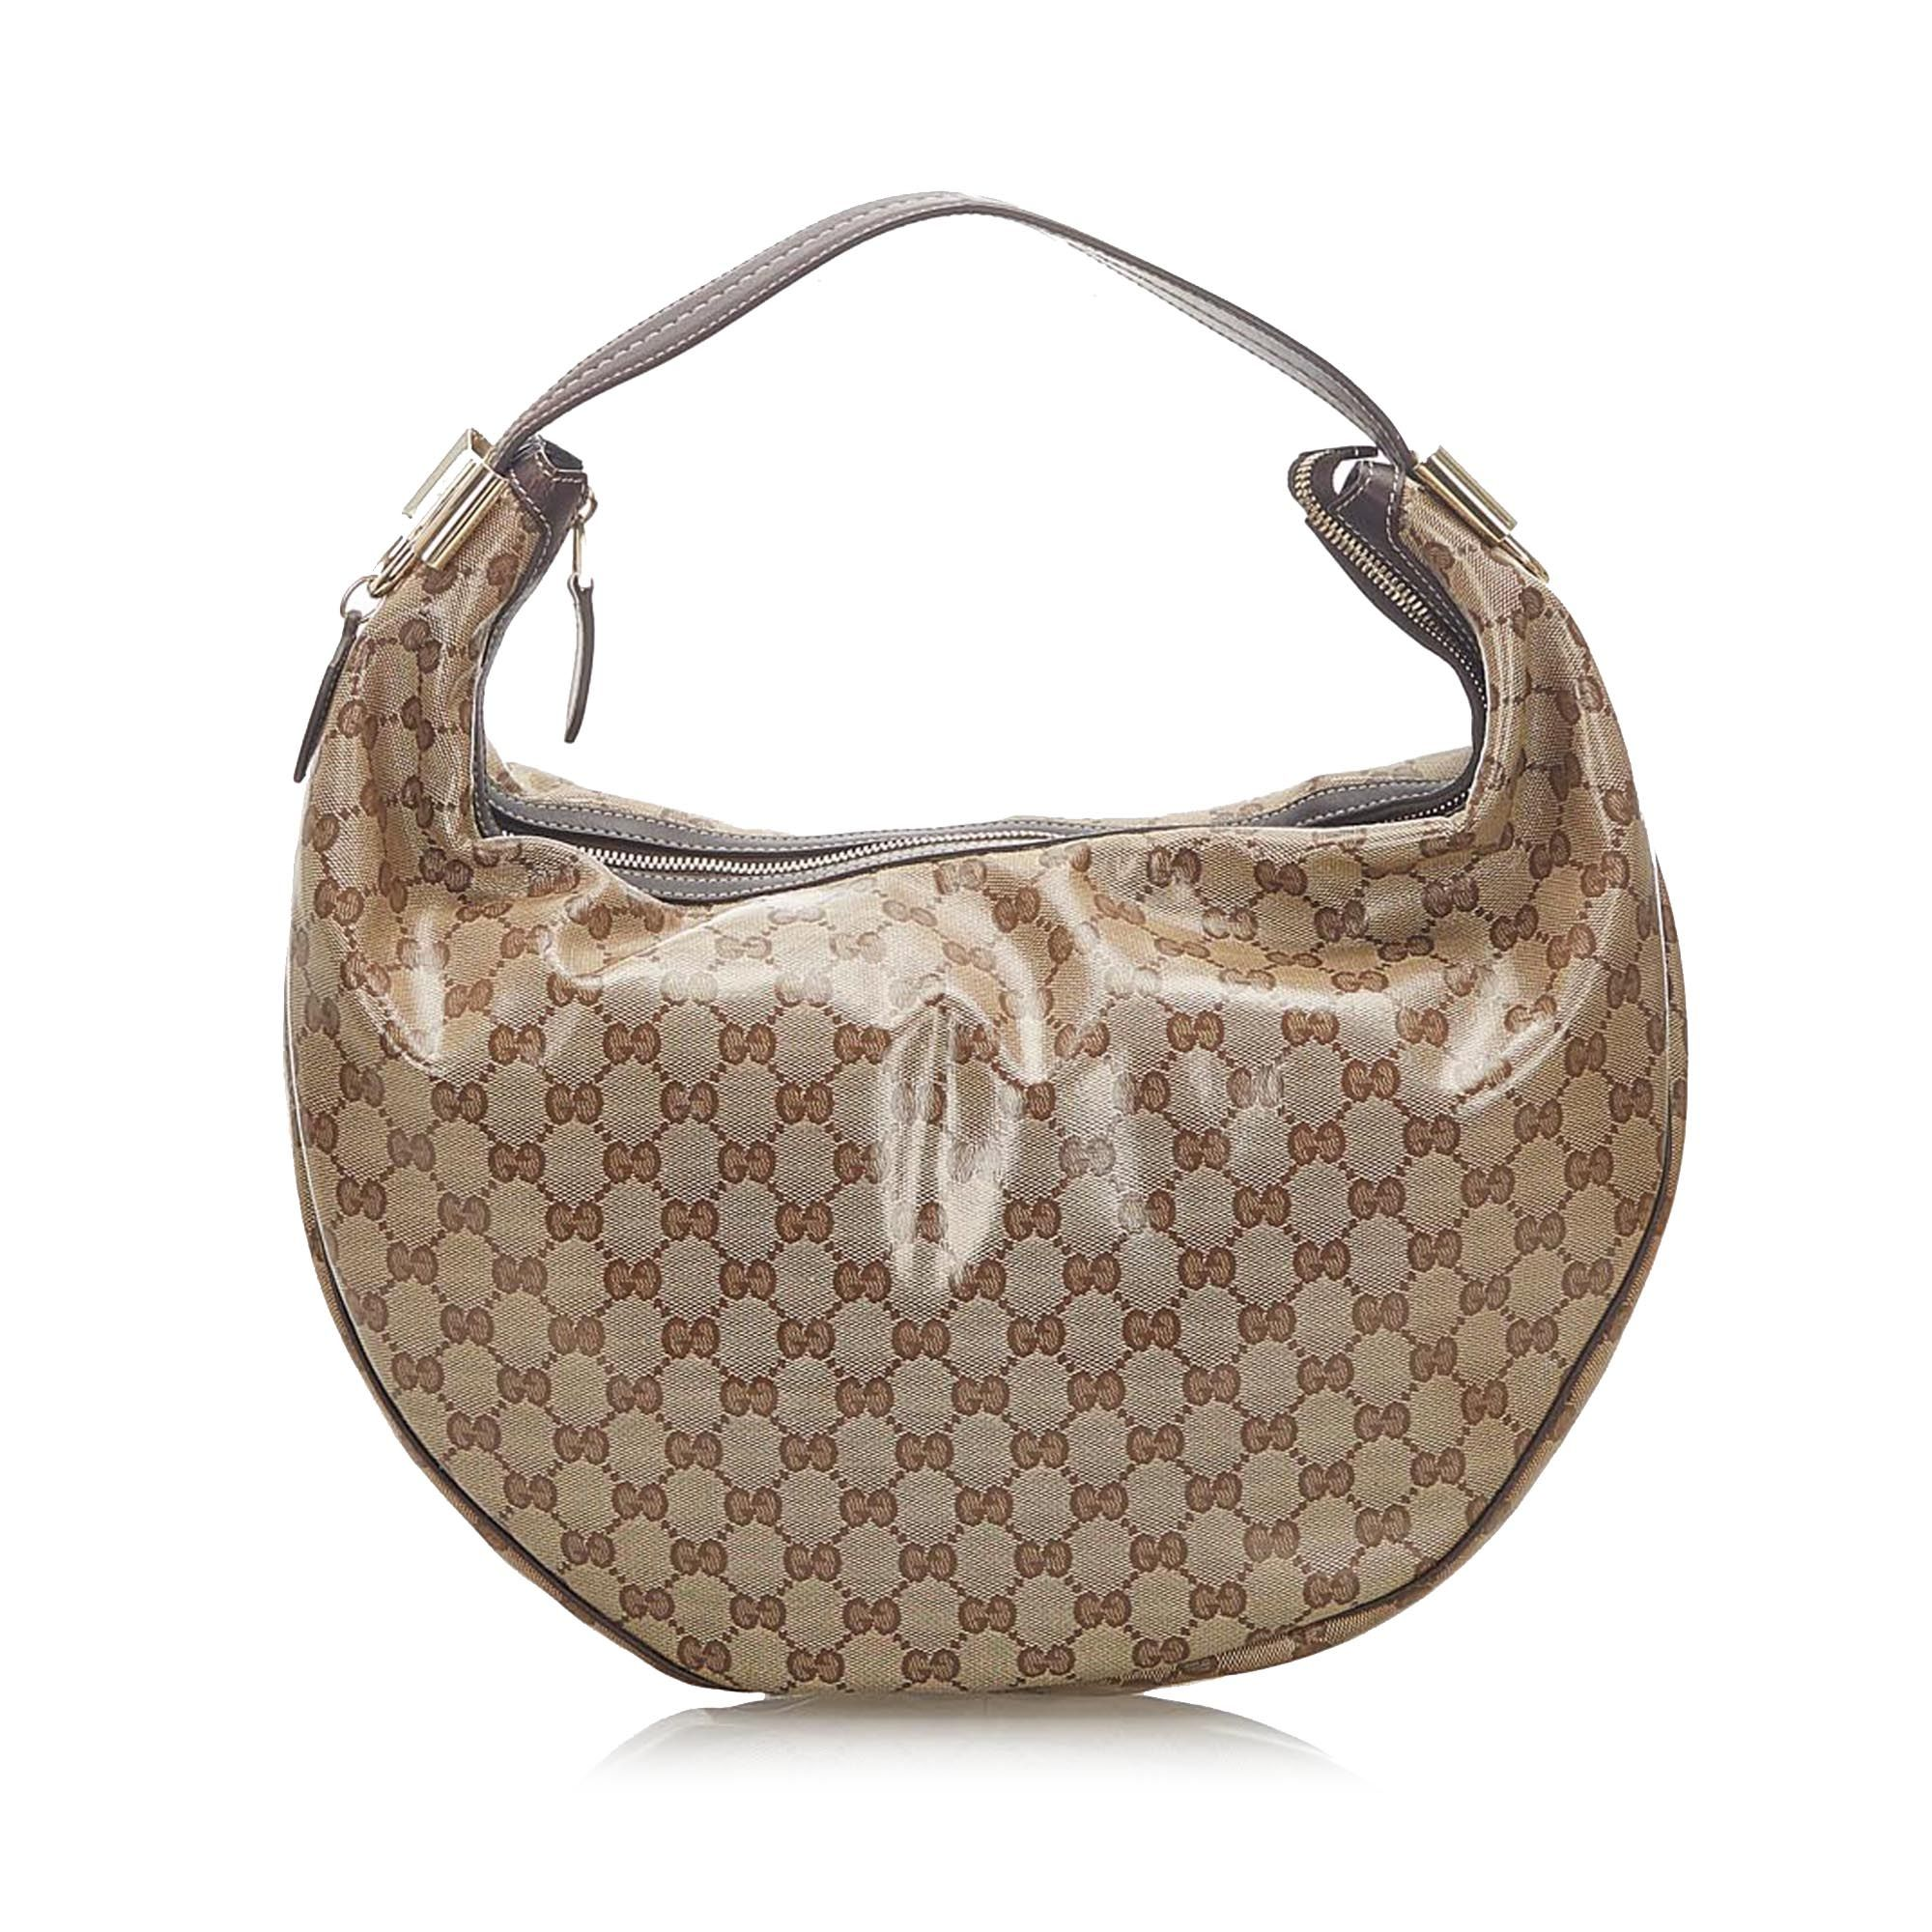 Vintage Gucci GG Crystal Duchessa Hobo Bag Brown